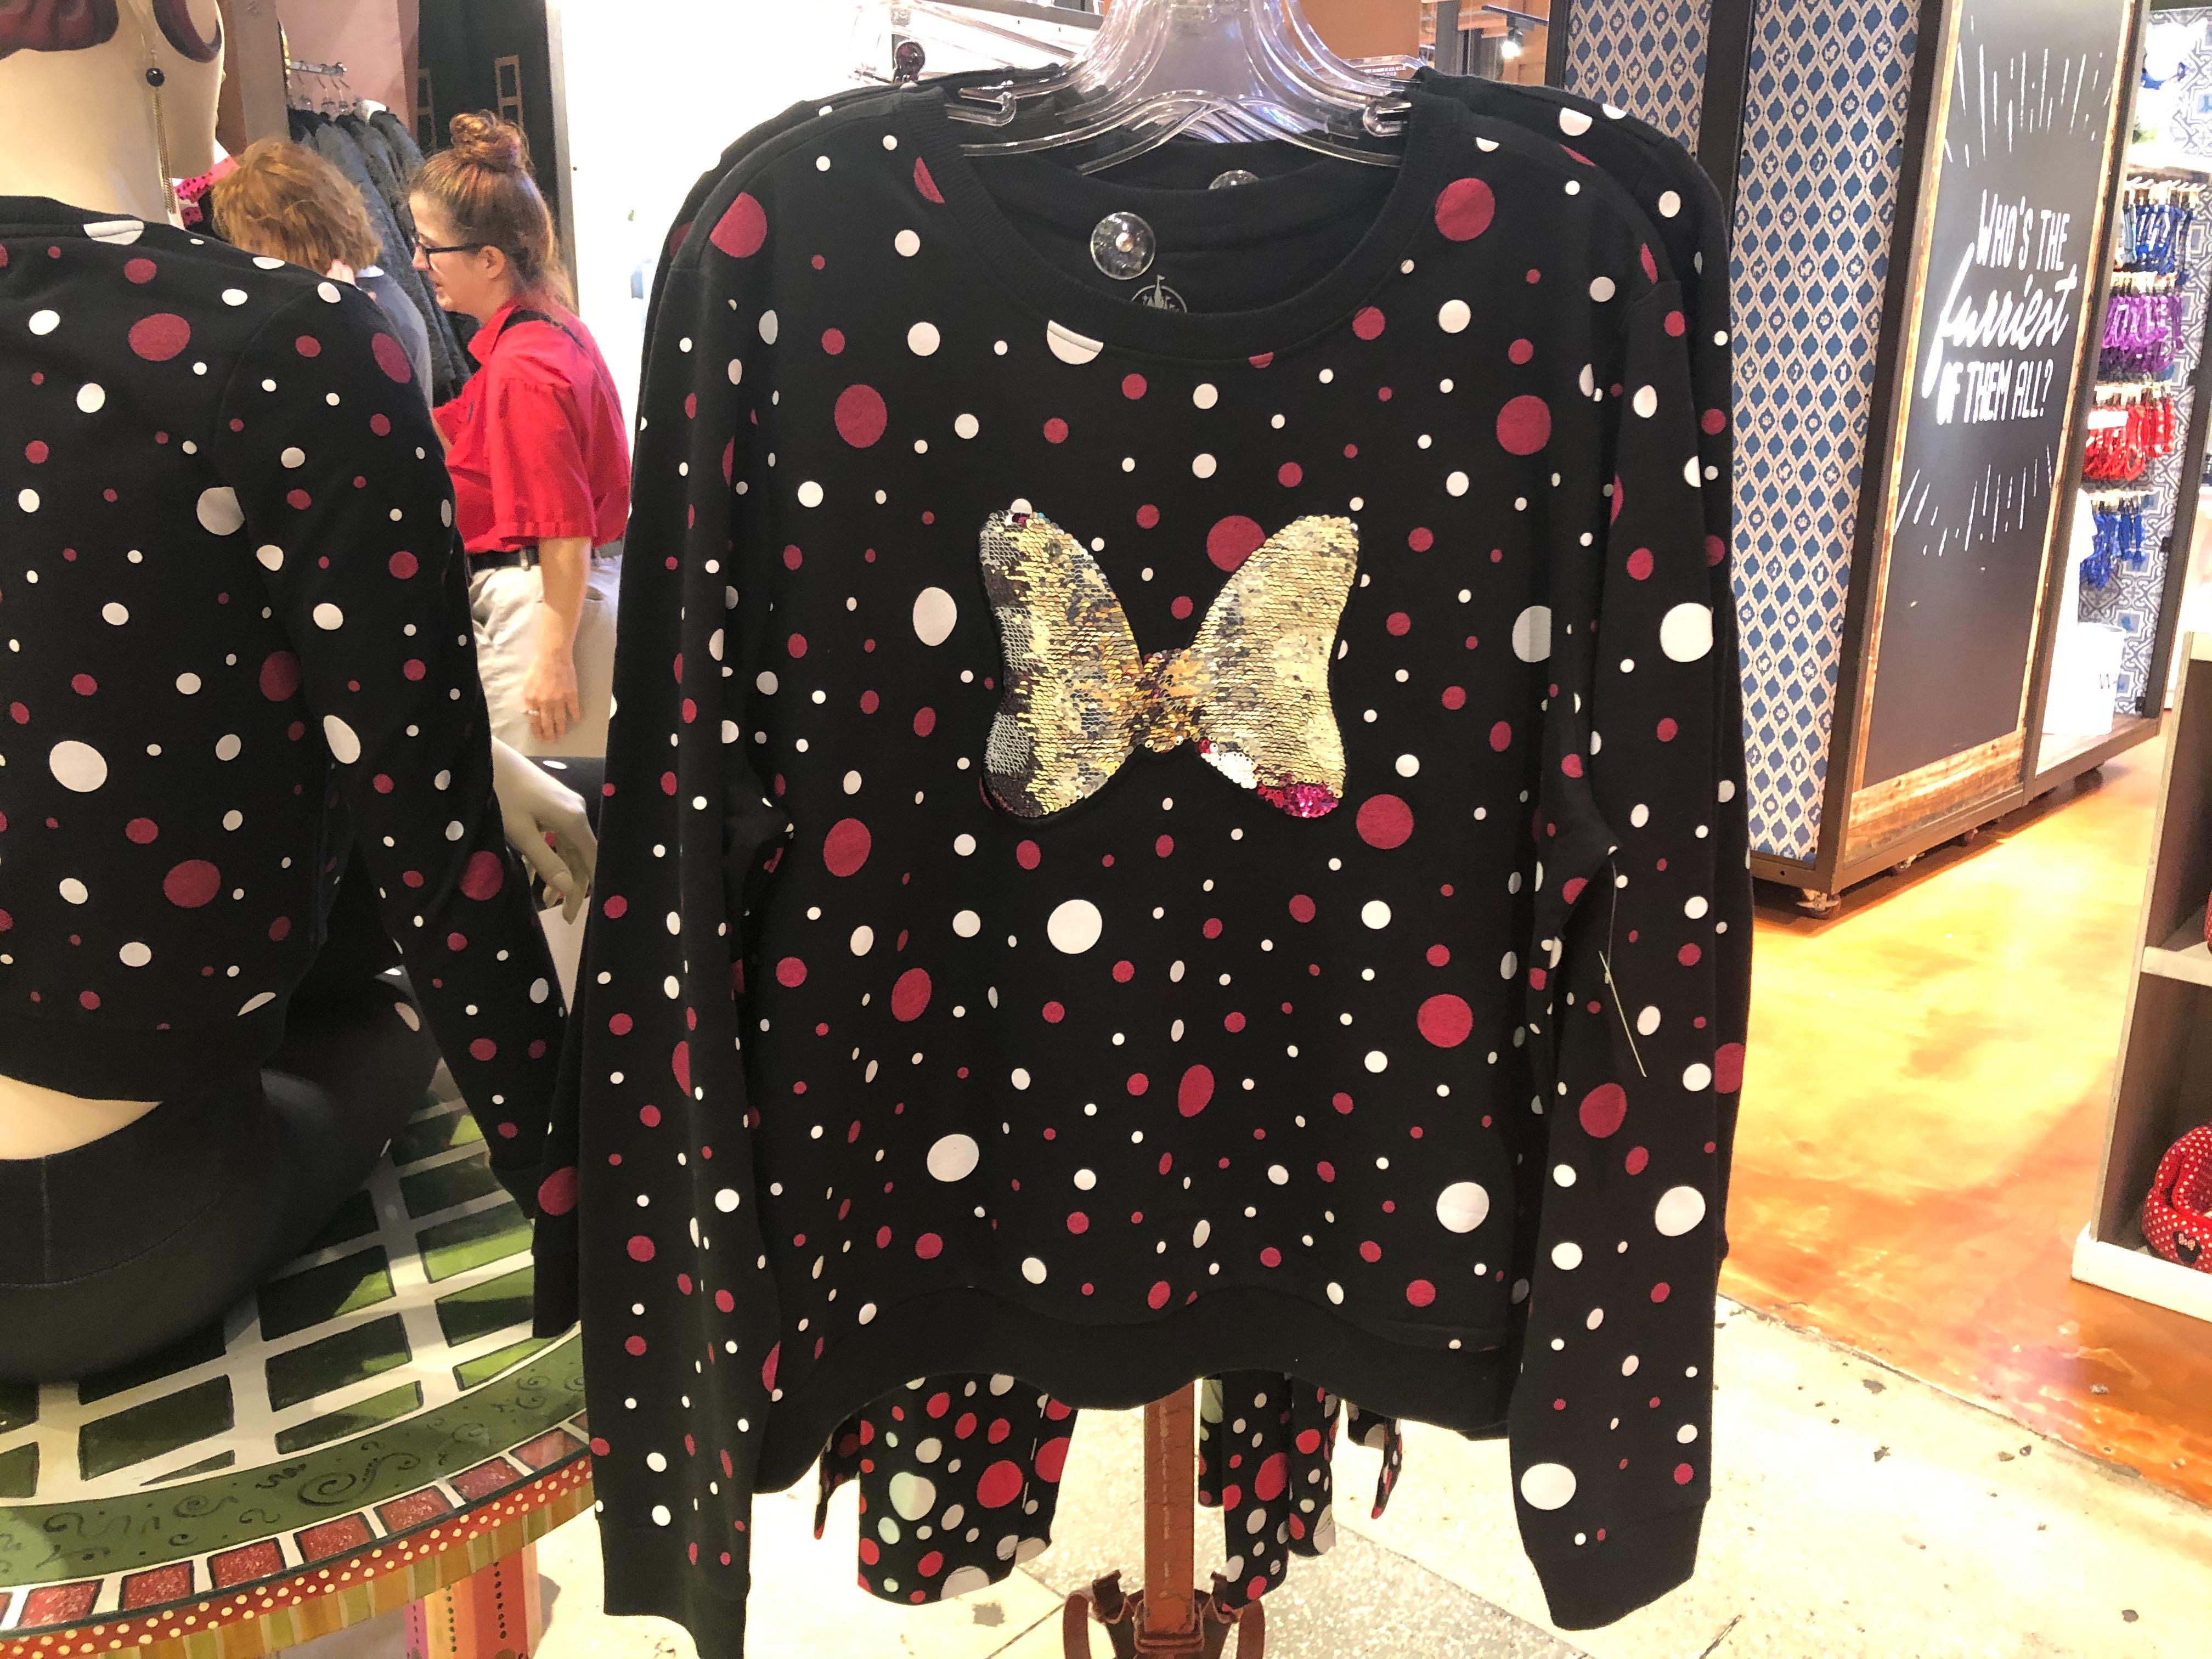 Rock The Dots Women's Flip Sequined Long-Sleeved T-Shirt